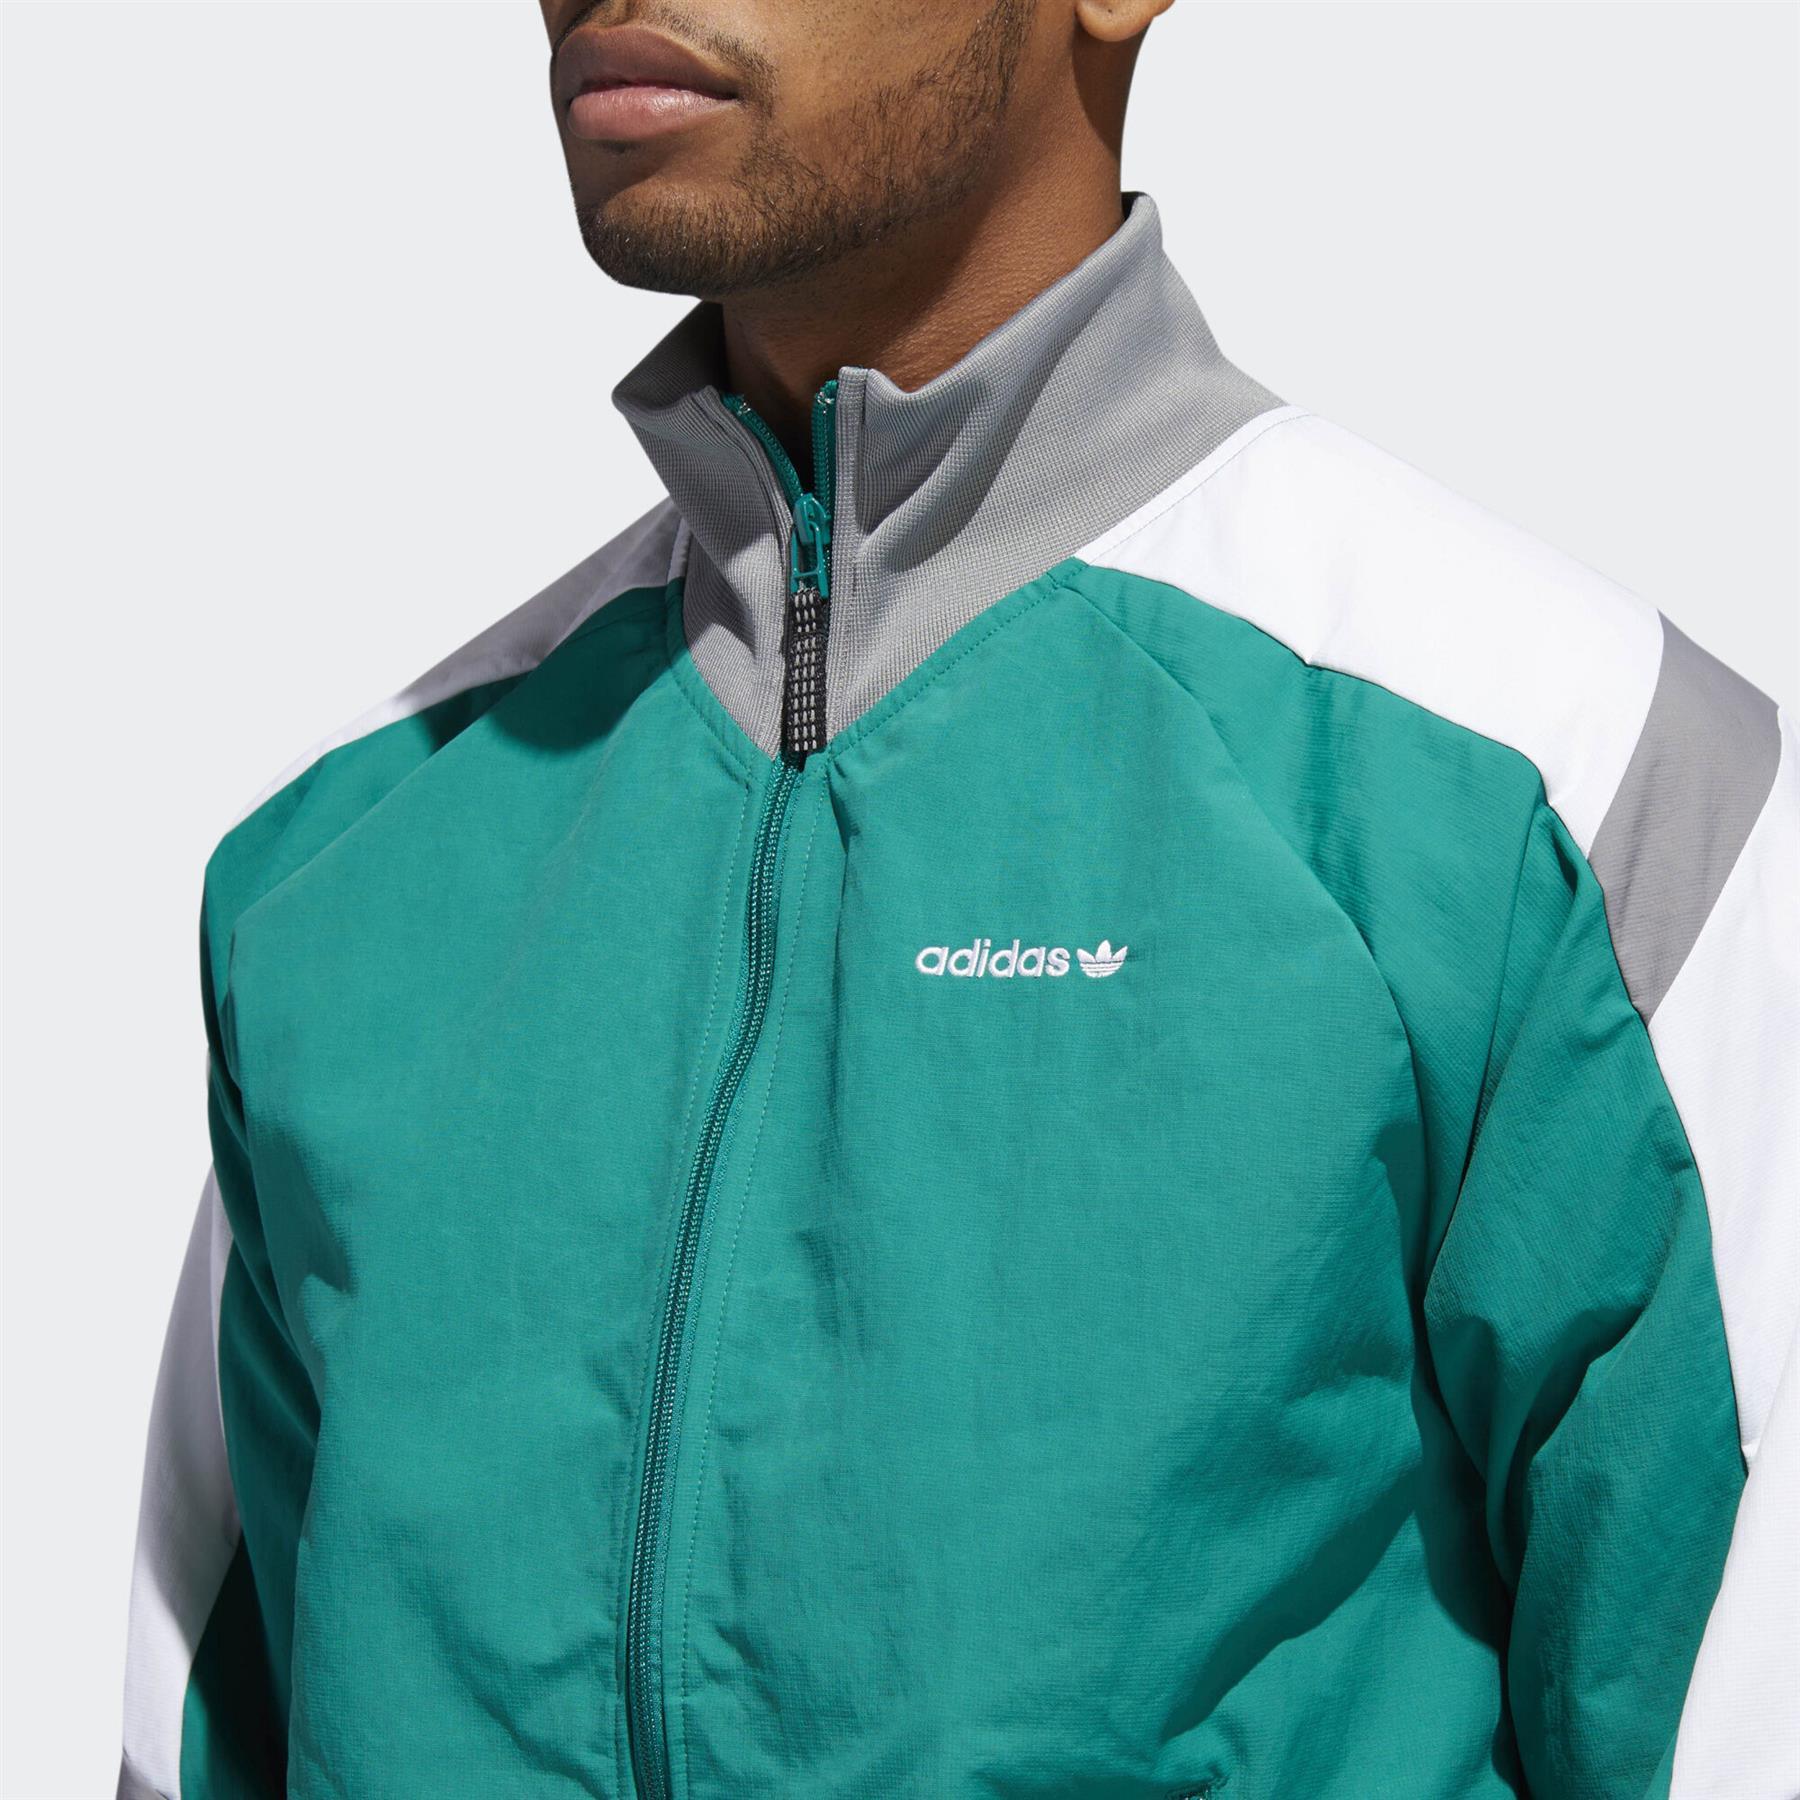 Details about adidas Originals EQT vintage L new Casuals Jacket superstar 90s Black